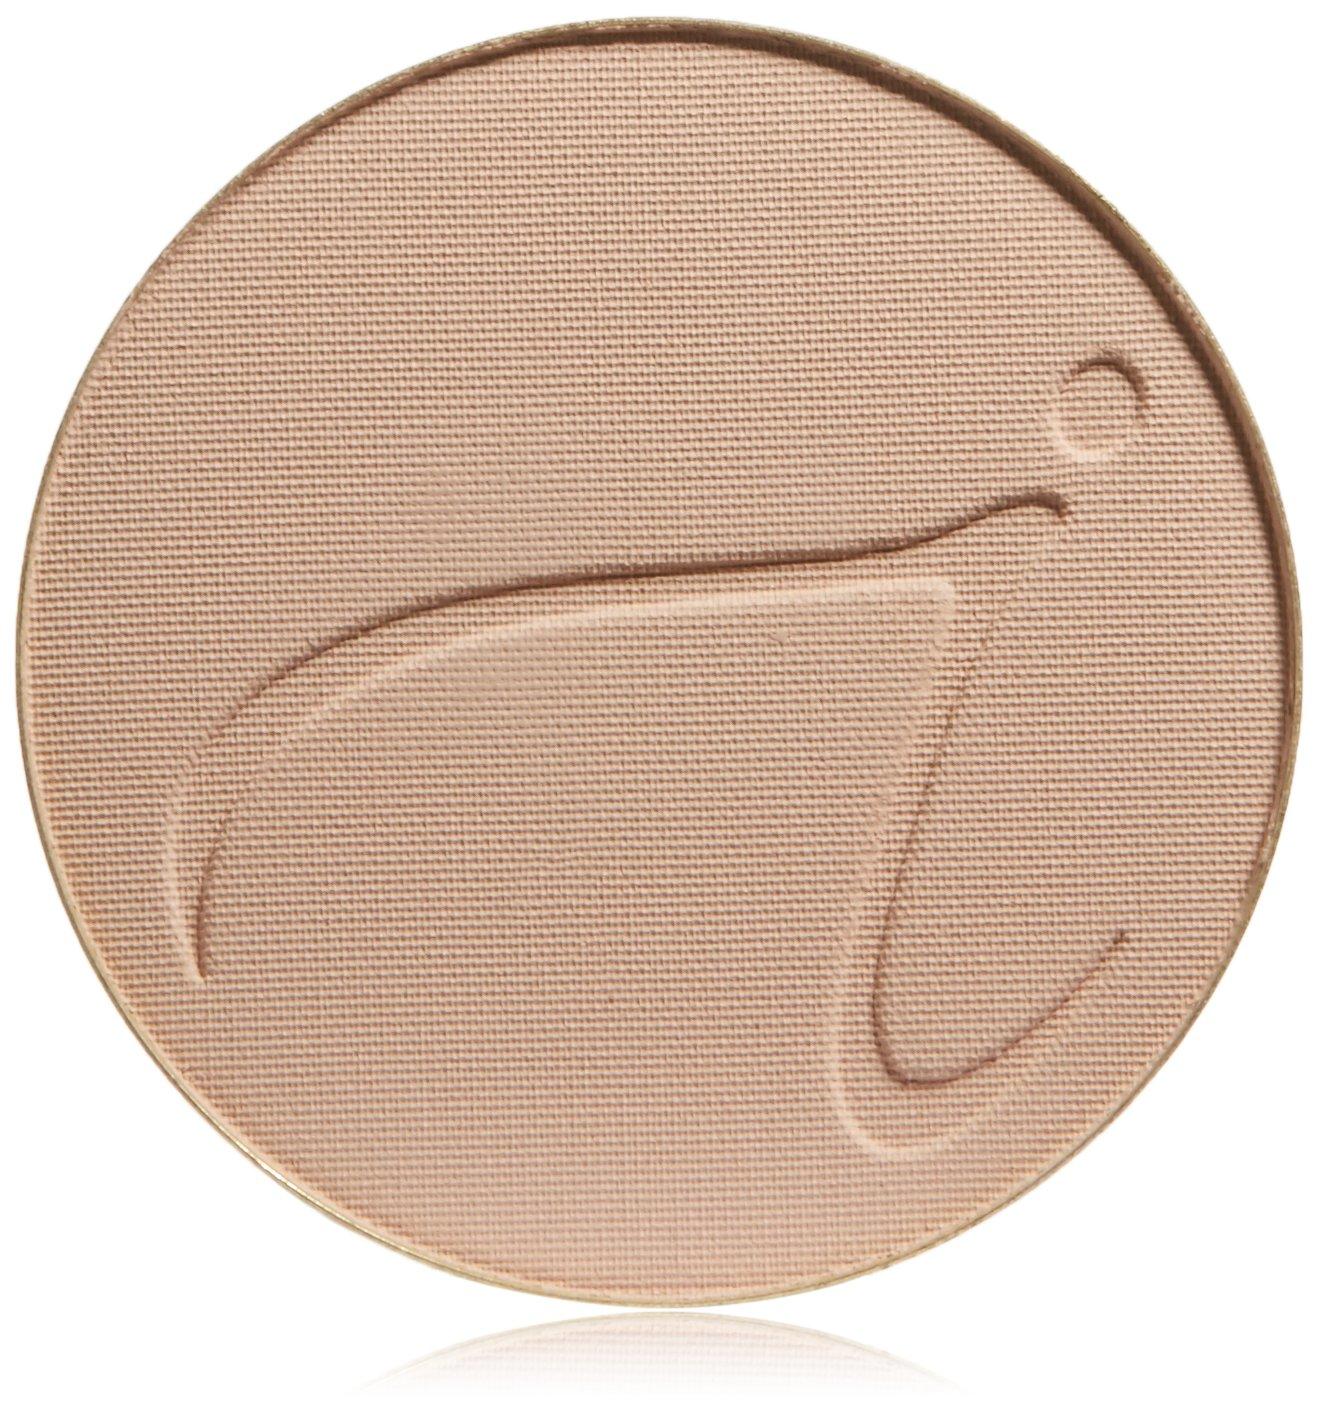 Base fondotinta Jane Iredale Kosmetik Purepressed LSF 20, ricarica, naturale, 9,9g. Iredale Mineral Cosmetics 12805E